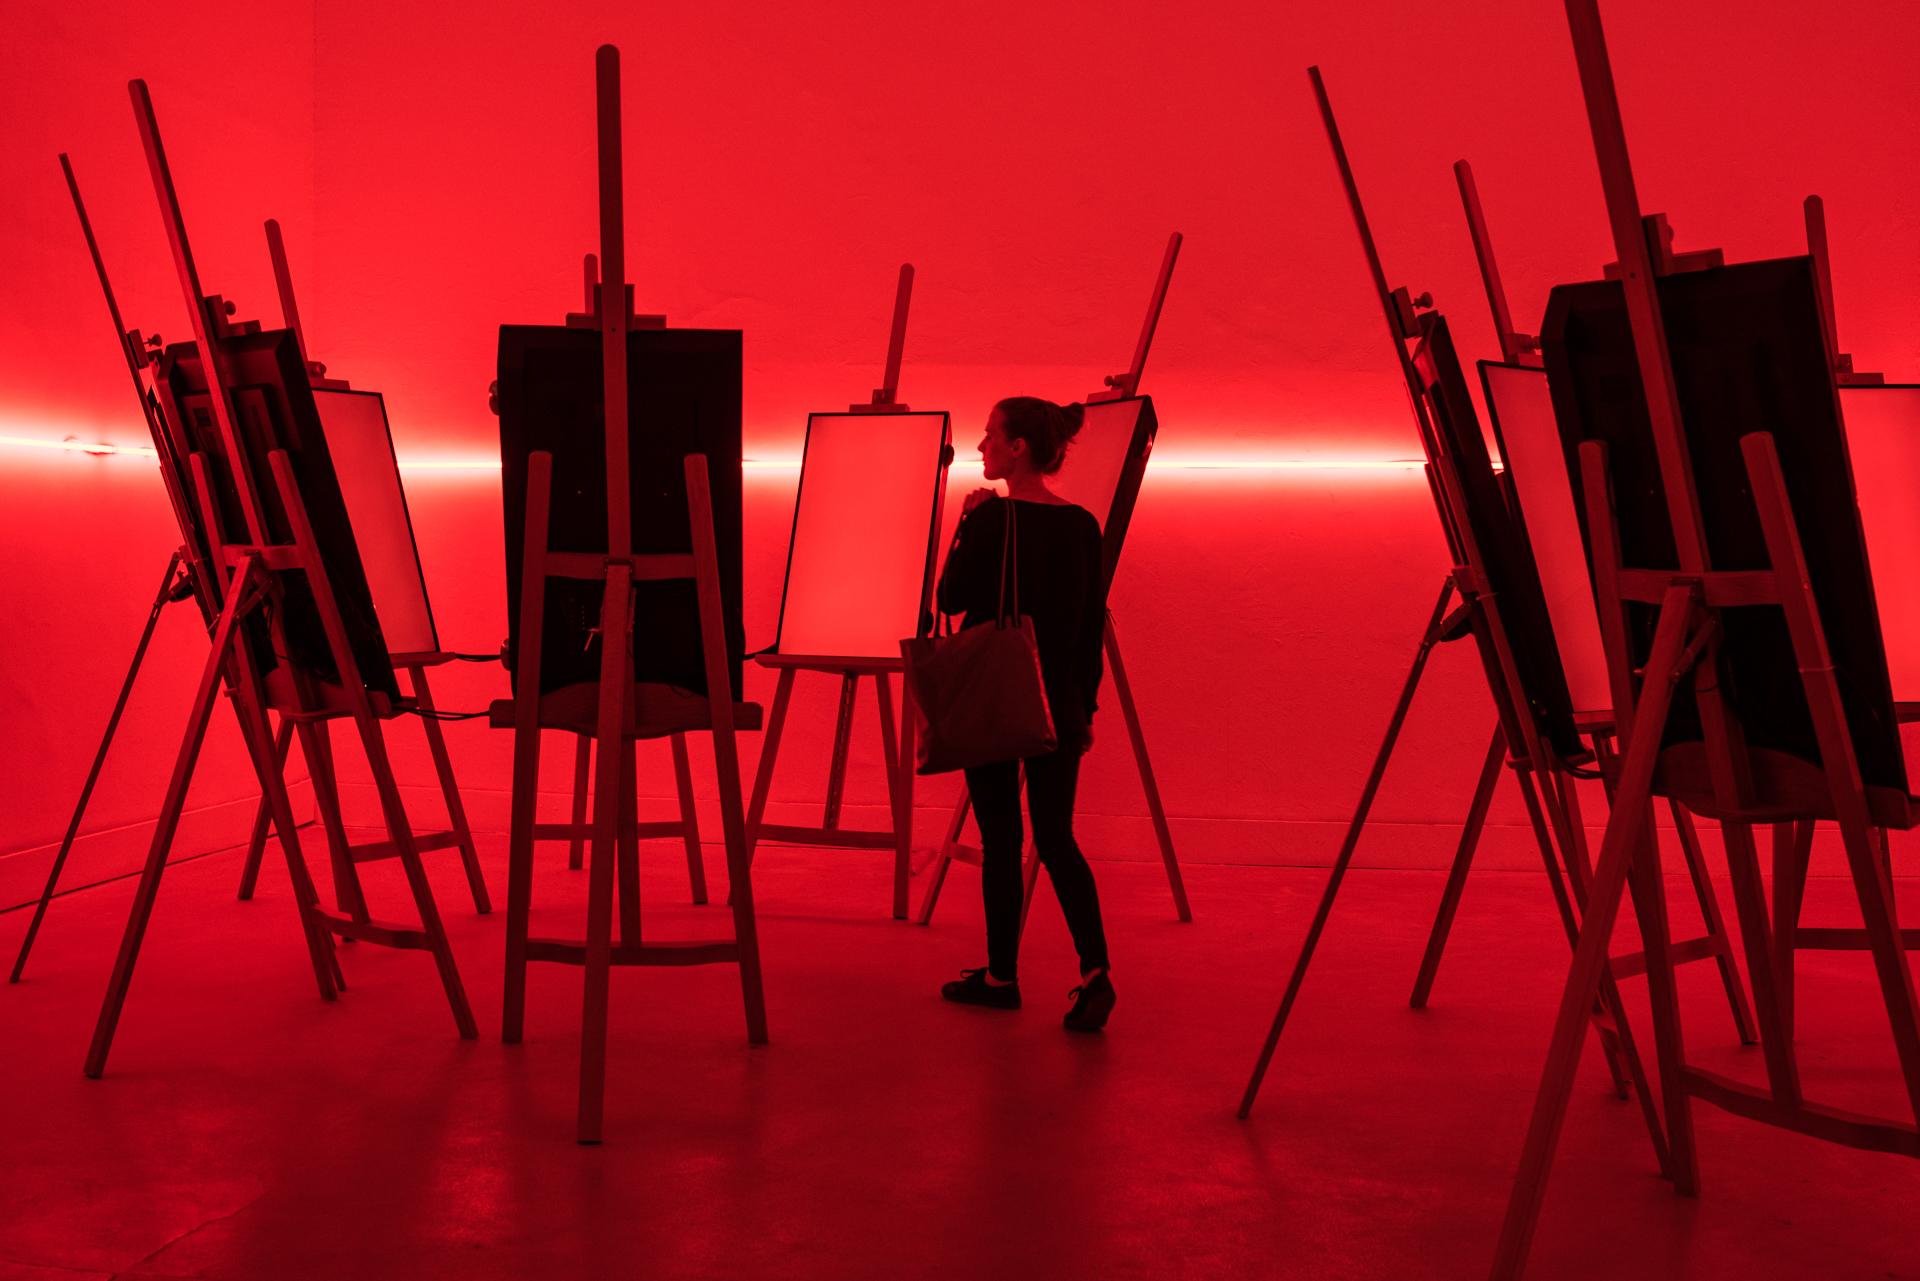 ANDES SHADOW La Biennale di Venezia 2016 © Gonzalo Puga-8089